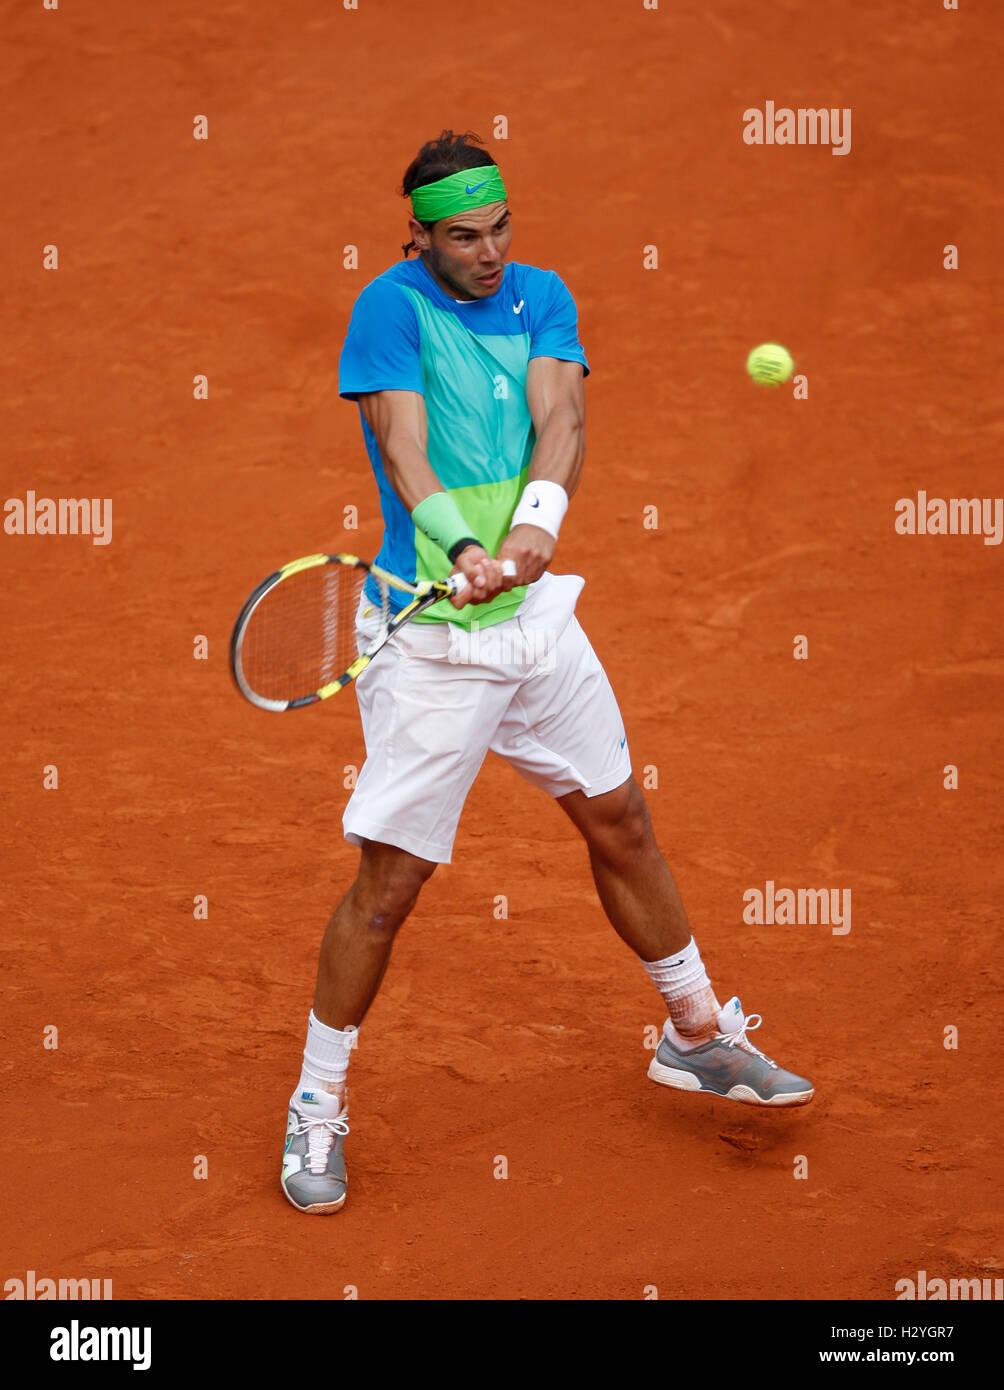 baee1c9fb0a9 Rafael Nadal